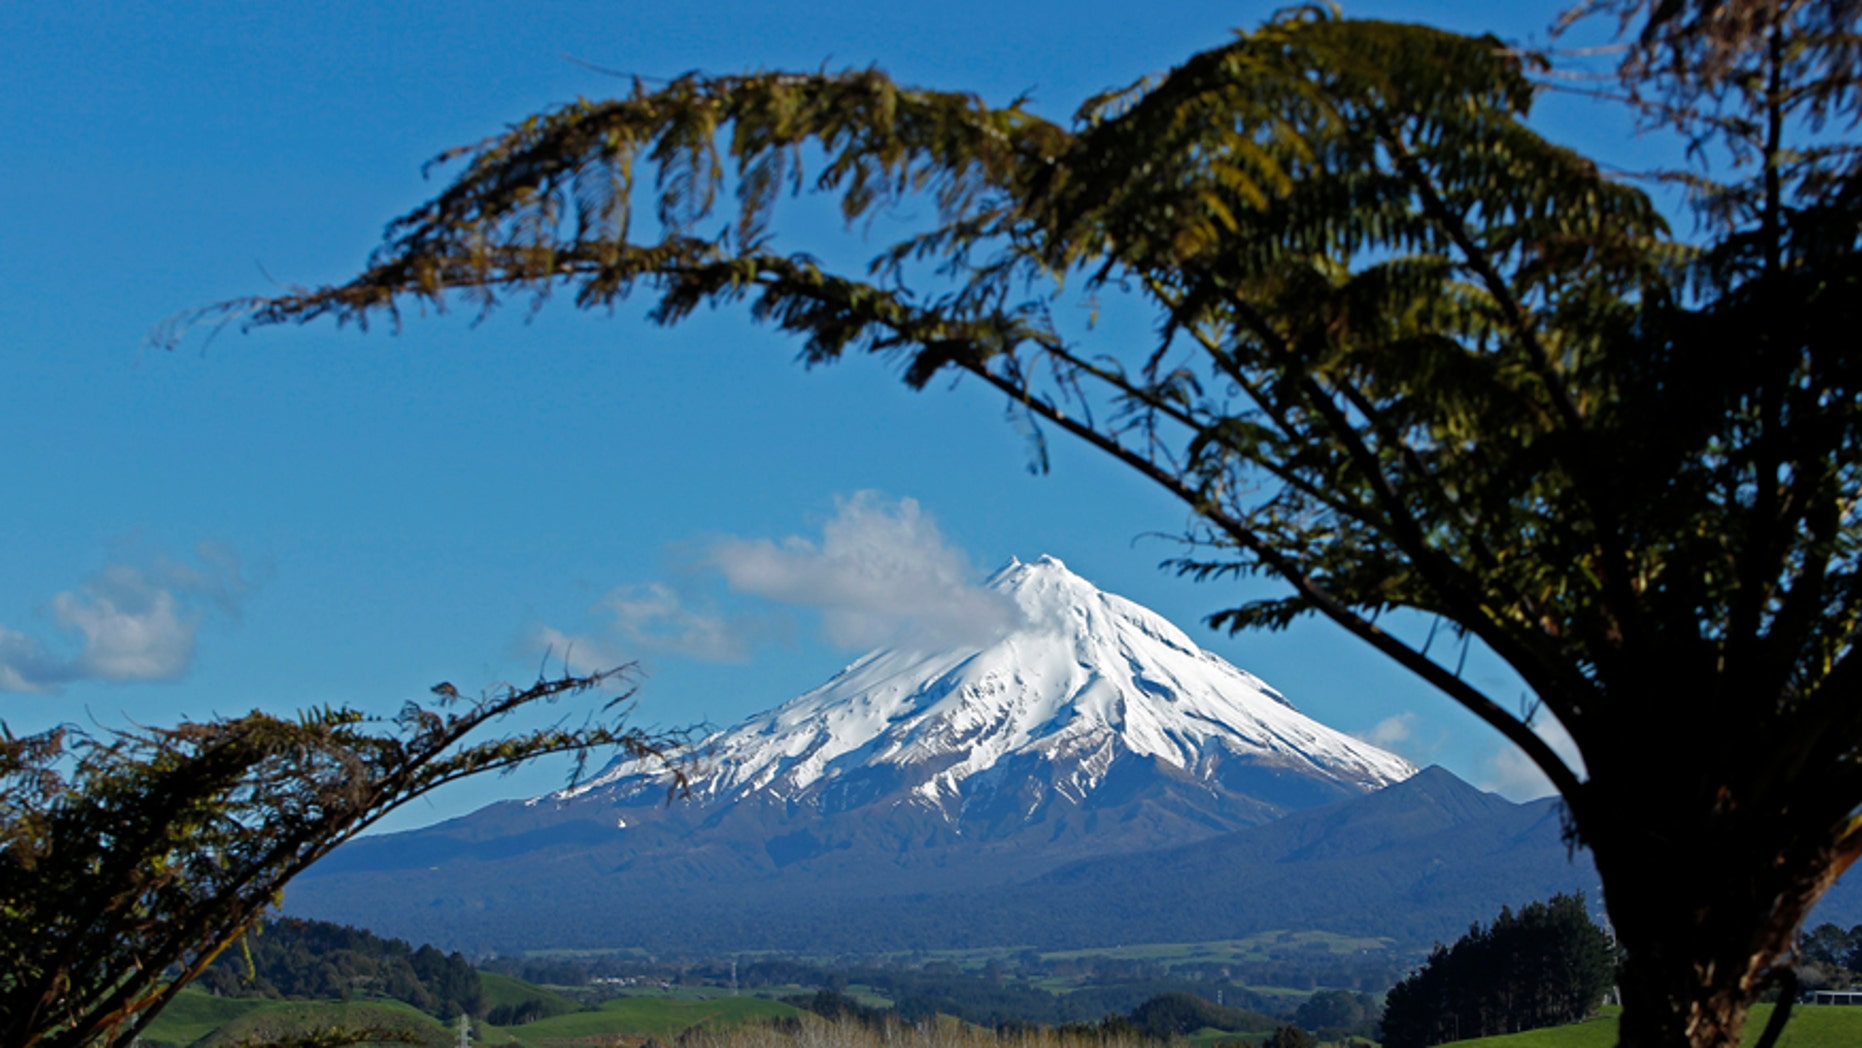 A view of Mount Taranaki near New Plymouth in New Zealand, September 26, 2011.